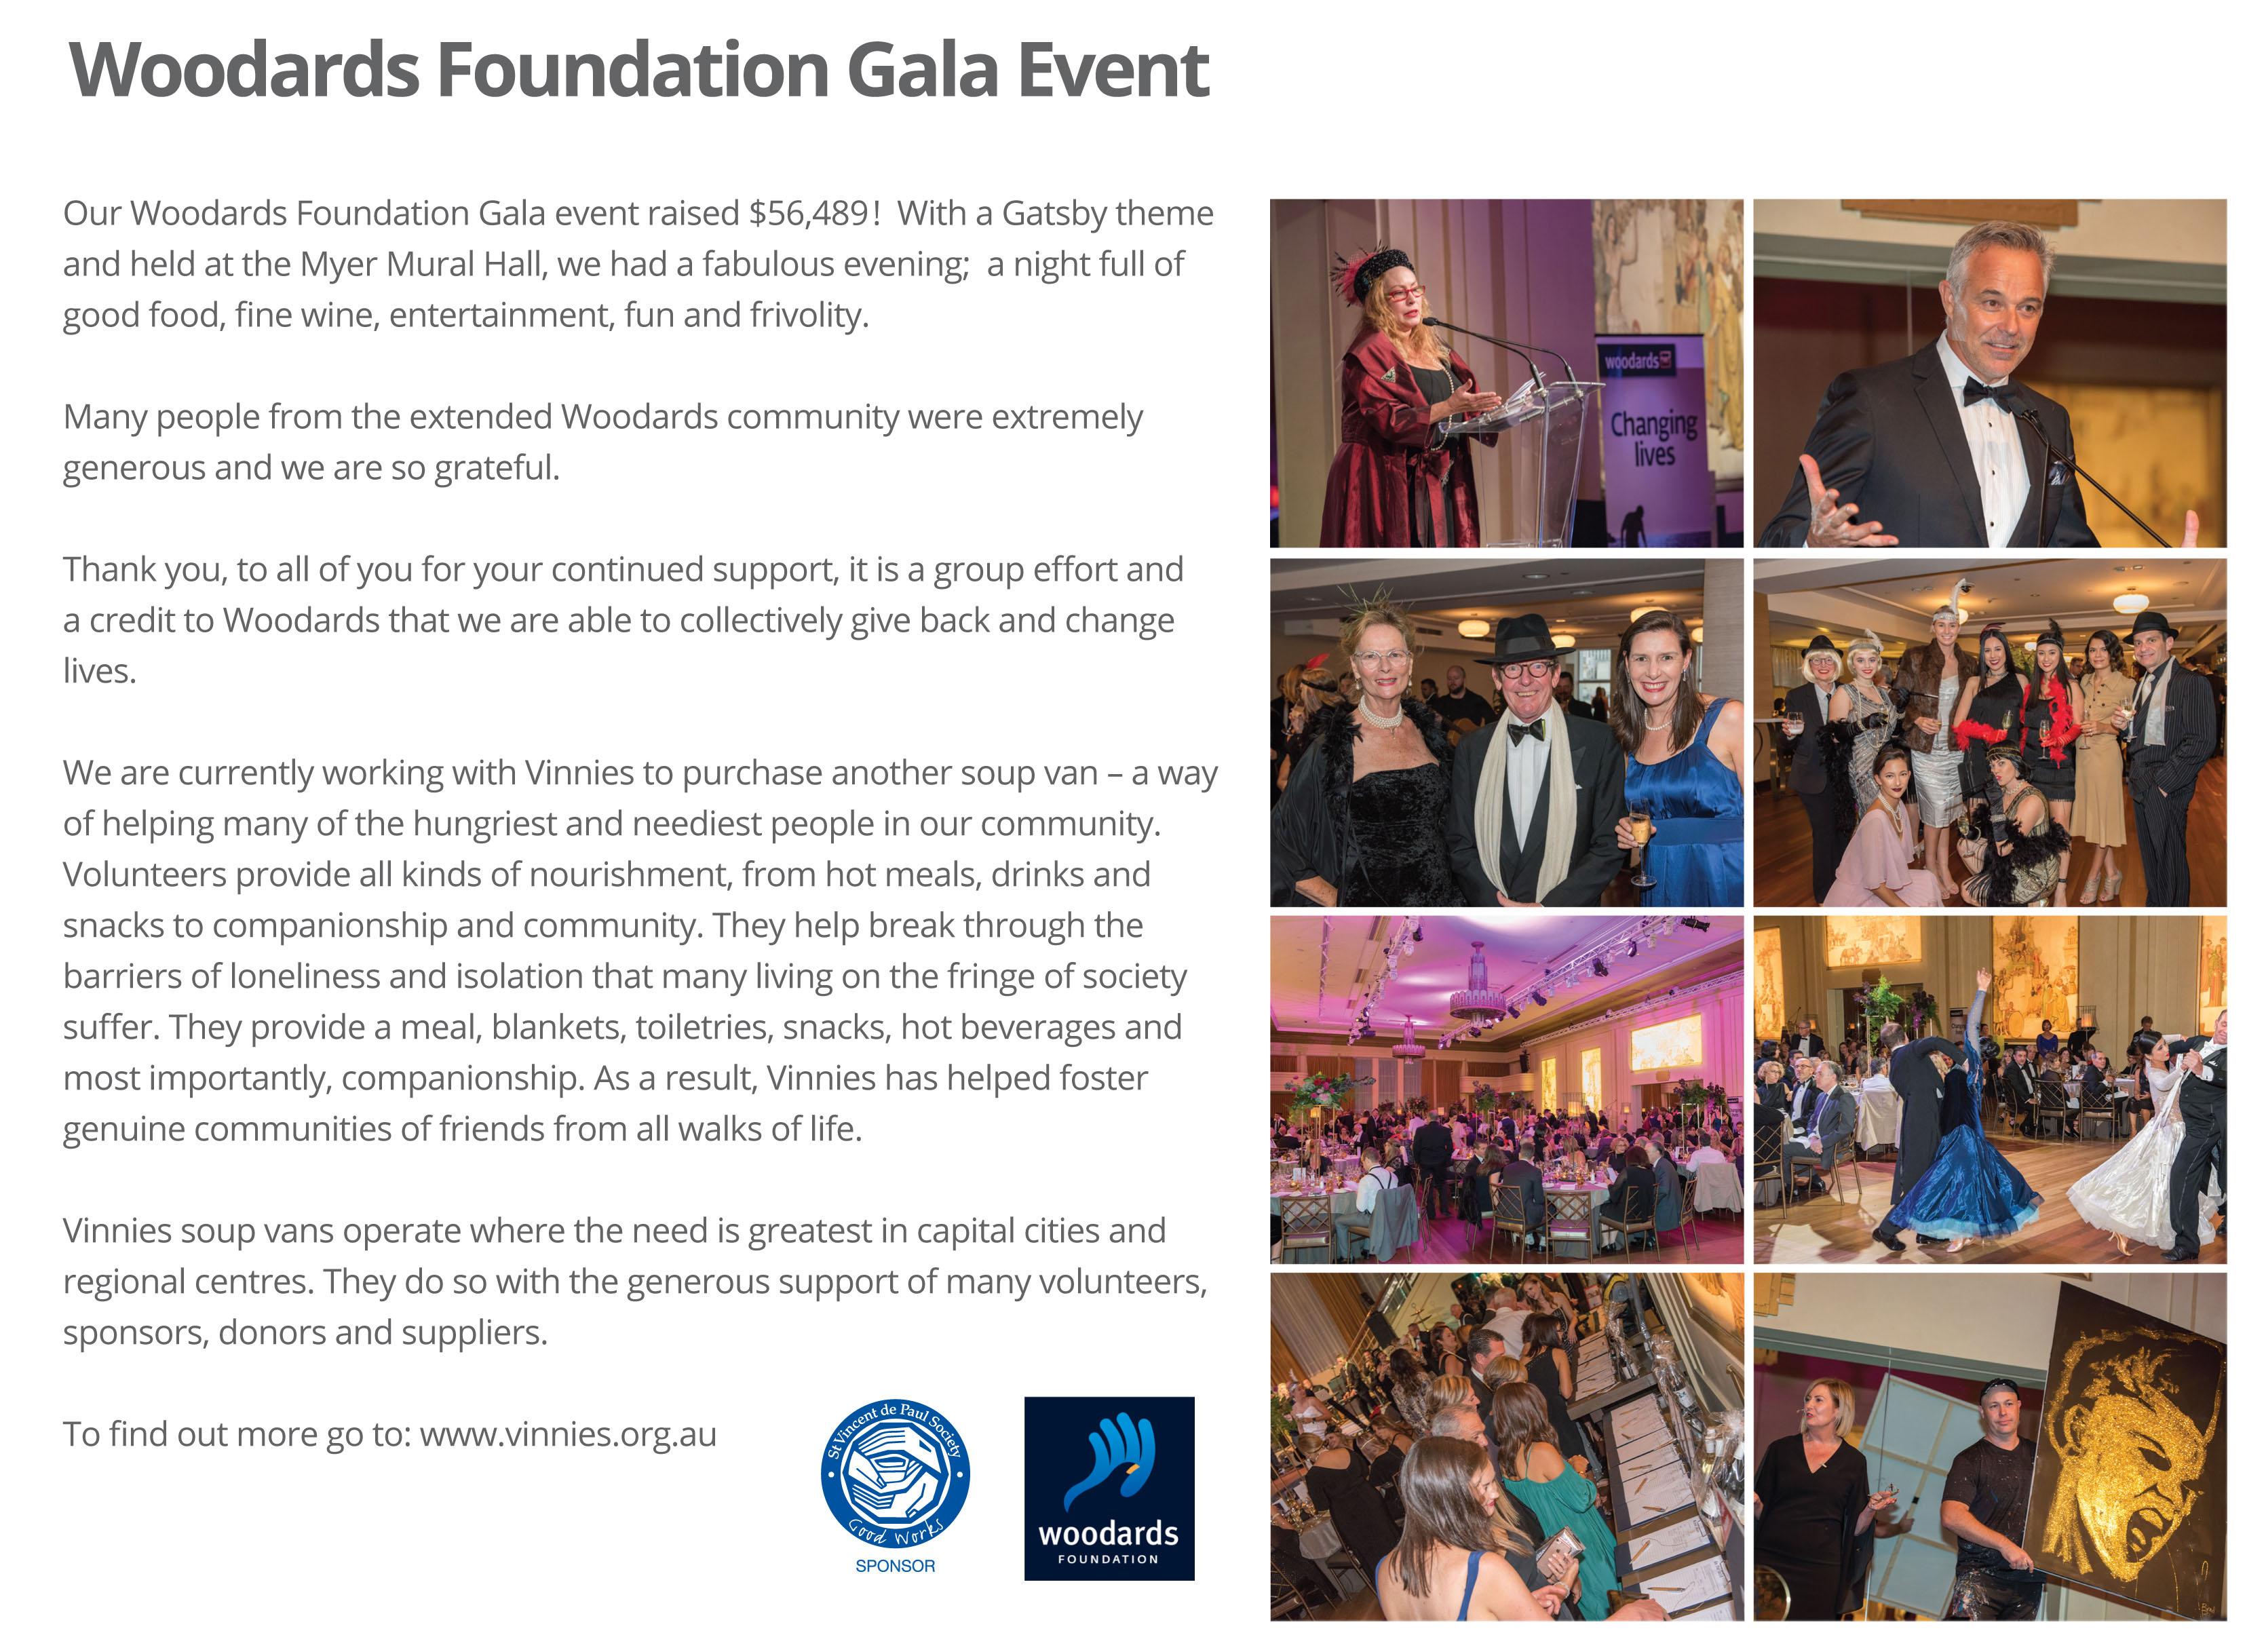 Woodards_Foundation_Gala_Event